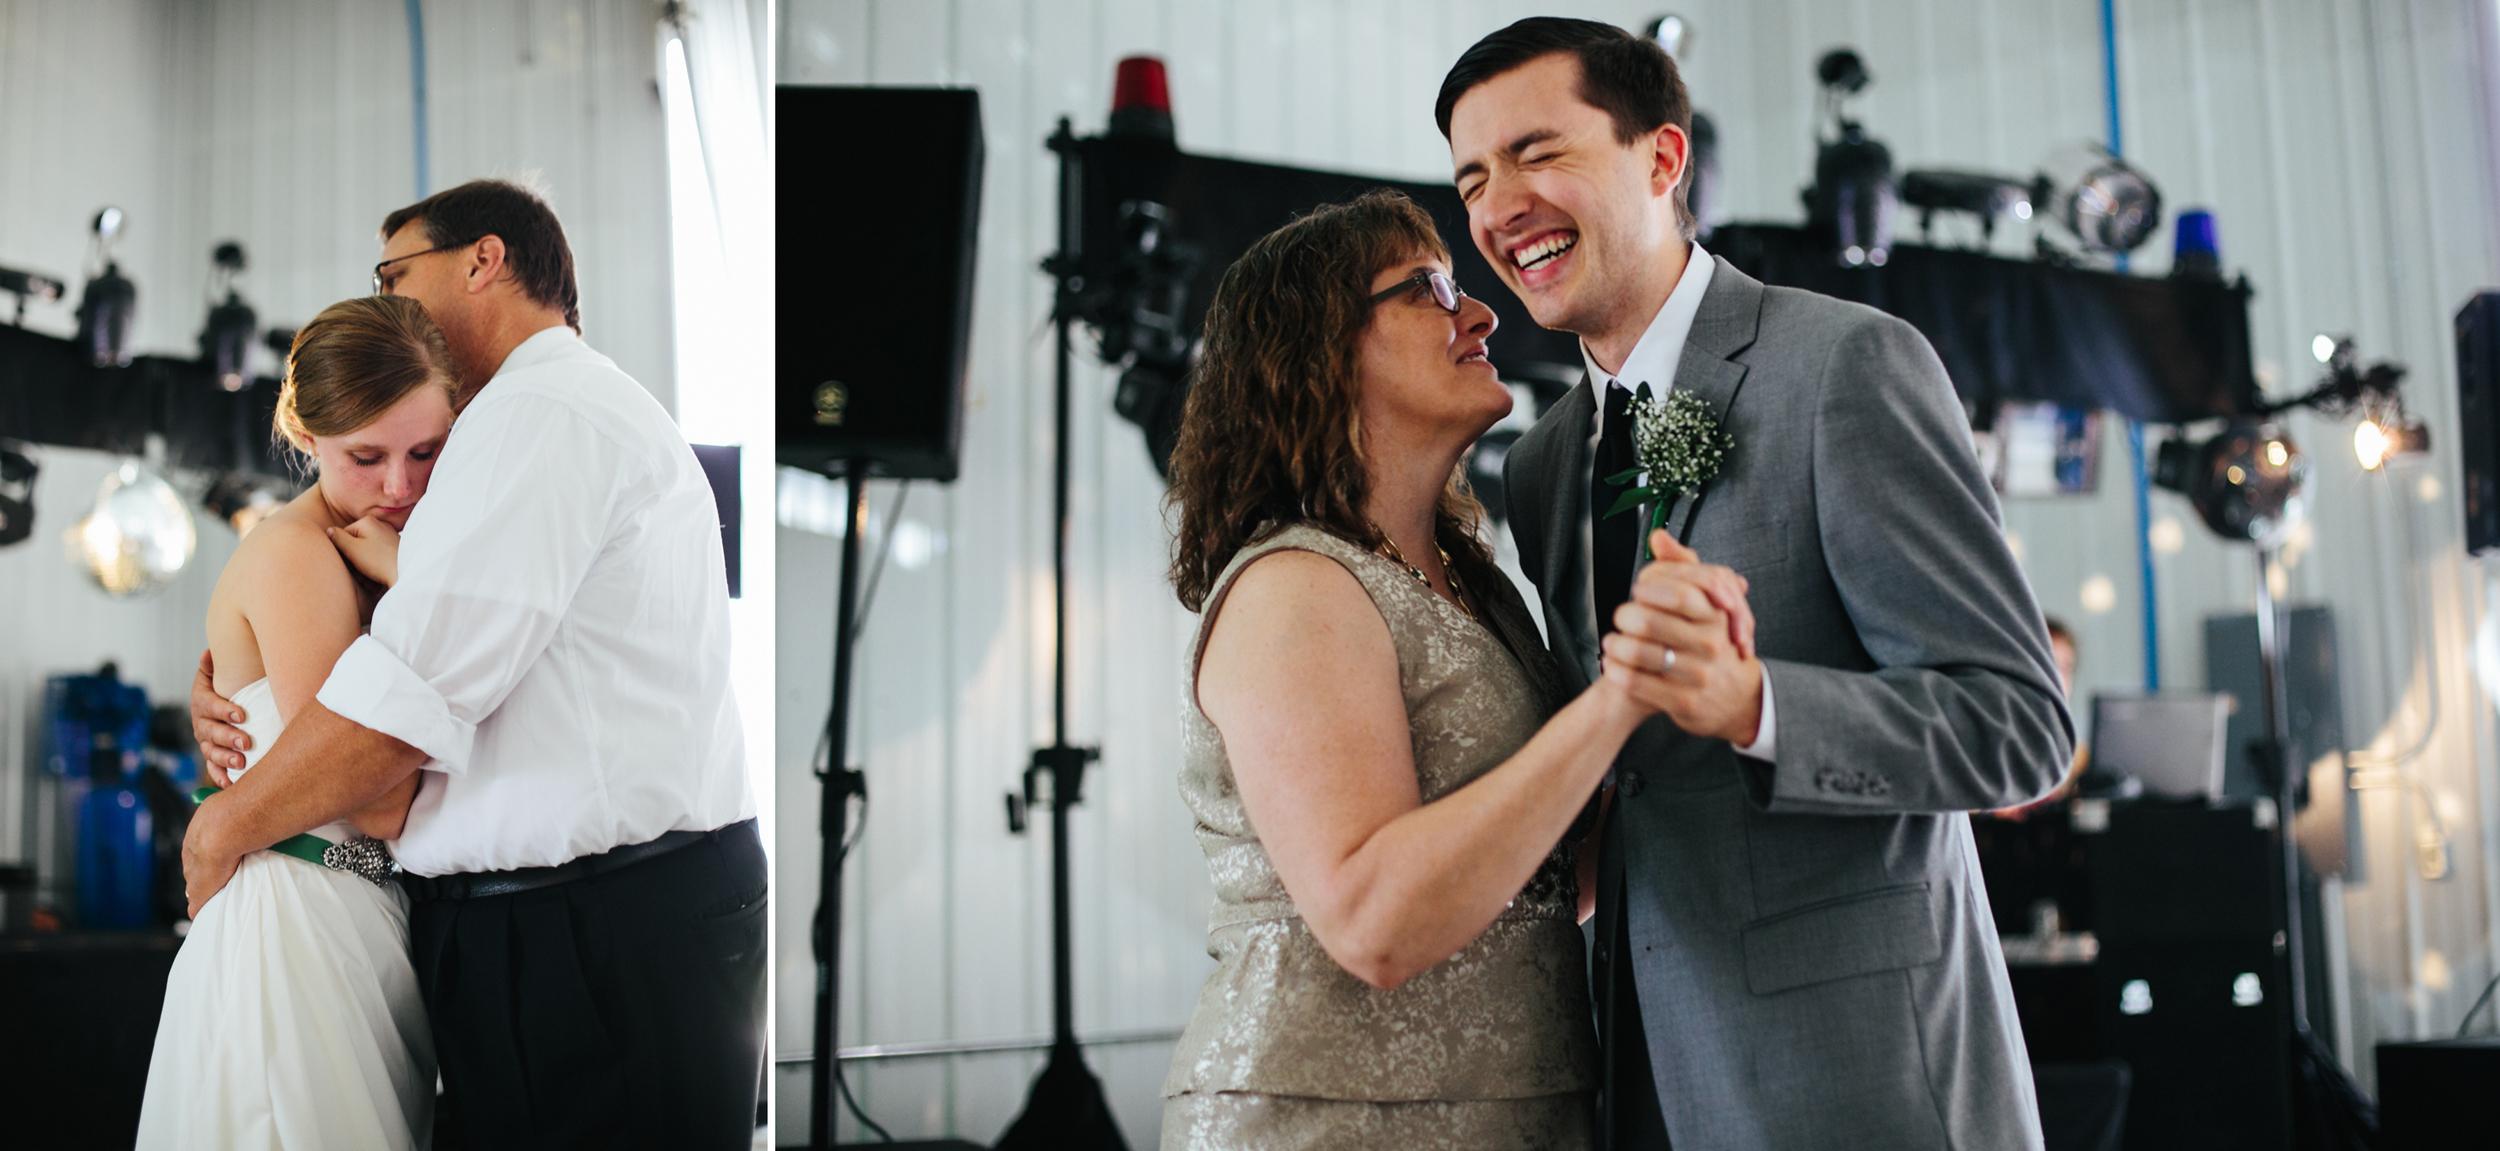 South-Dakota-Intimate-Wedding-39.jpg